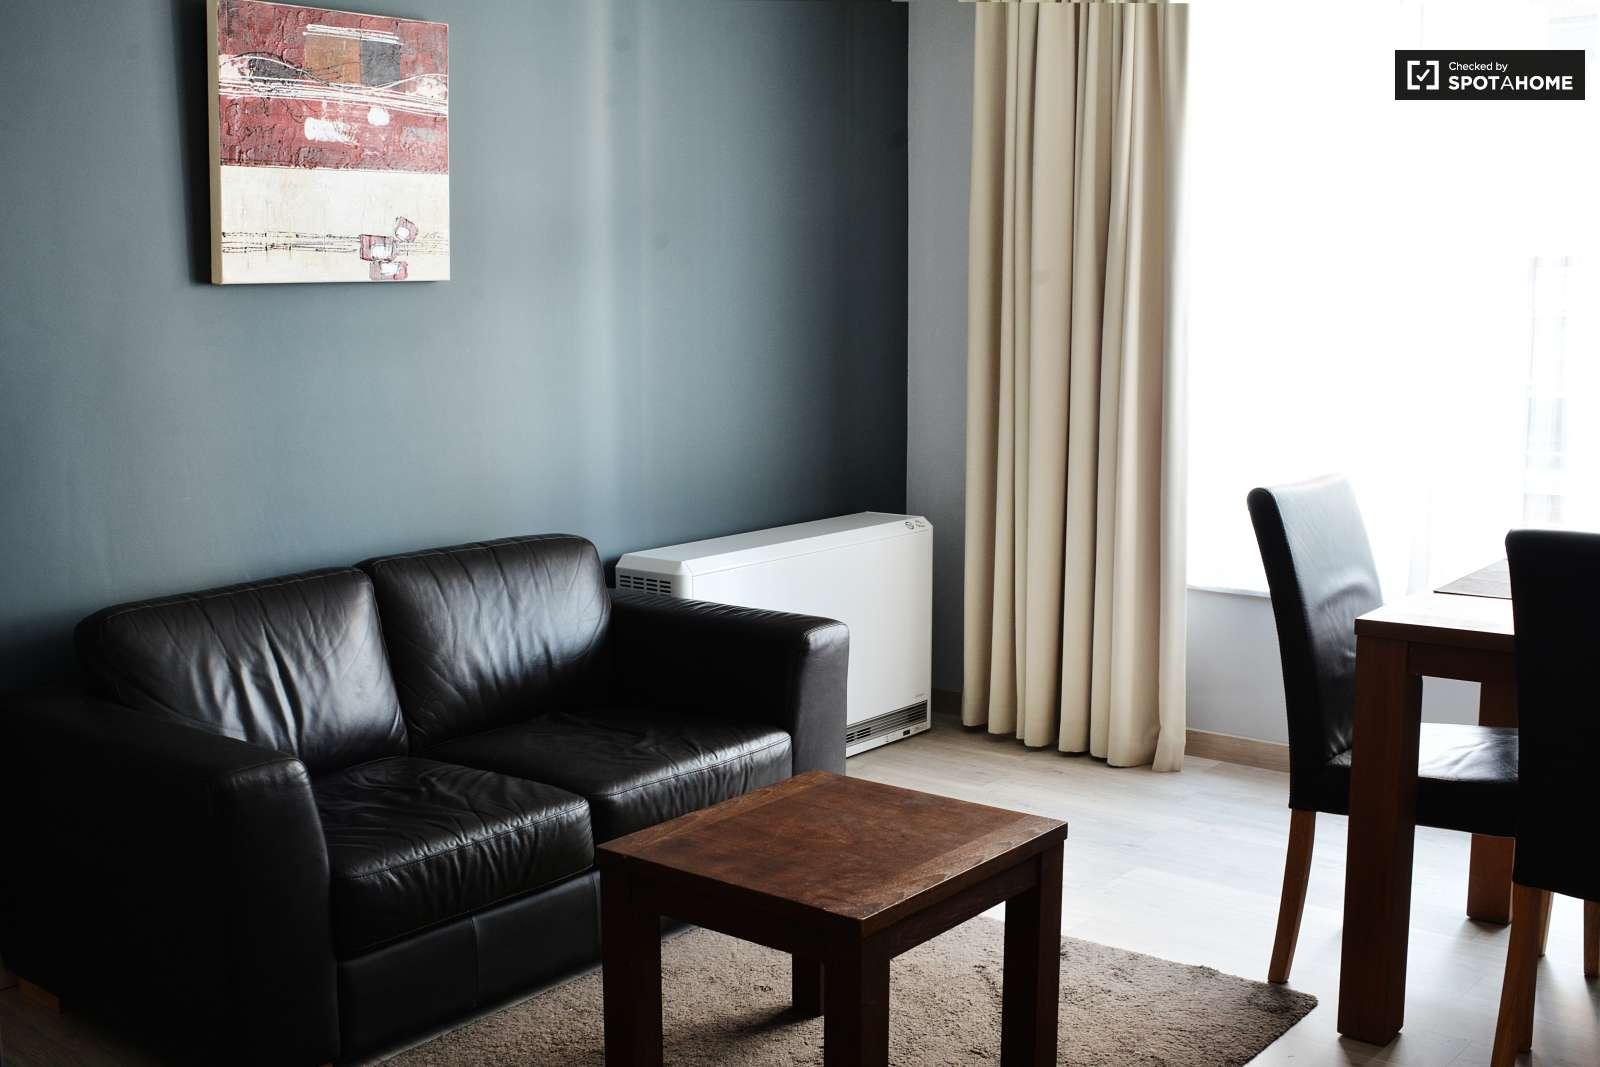 studio moderne louer bruxelles centre ref 96295 spotahome. Black Bedroom Furniture Sets. Home Design Ideas